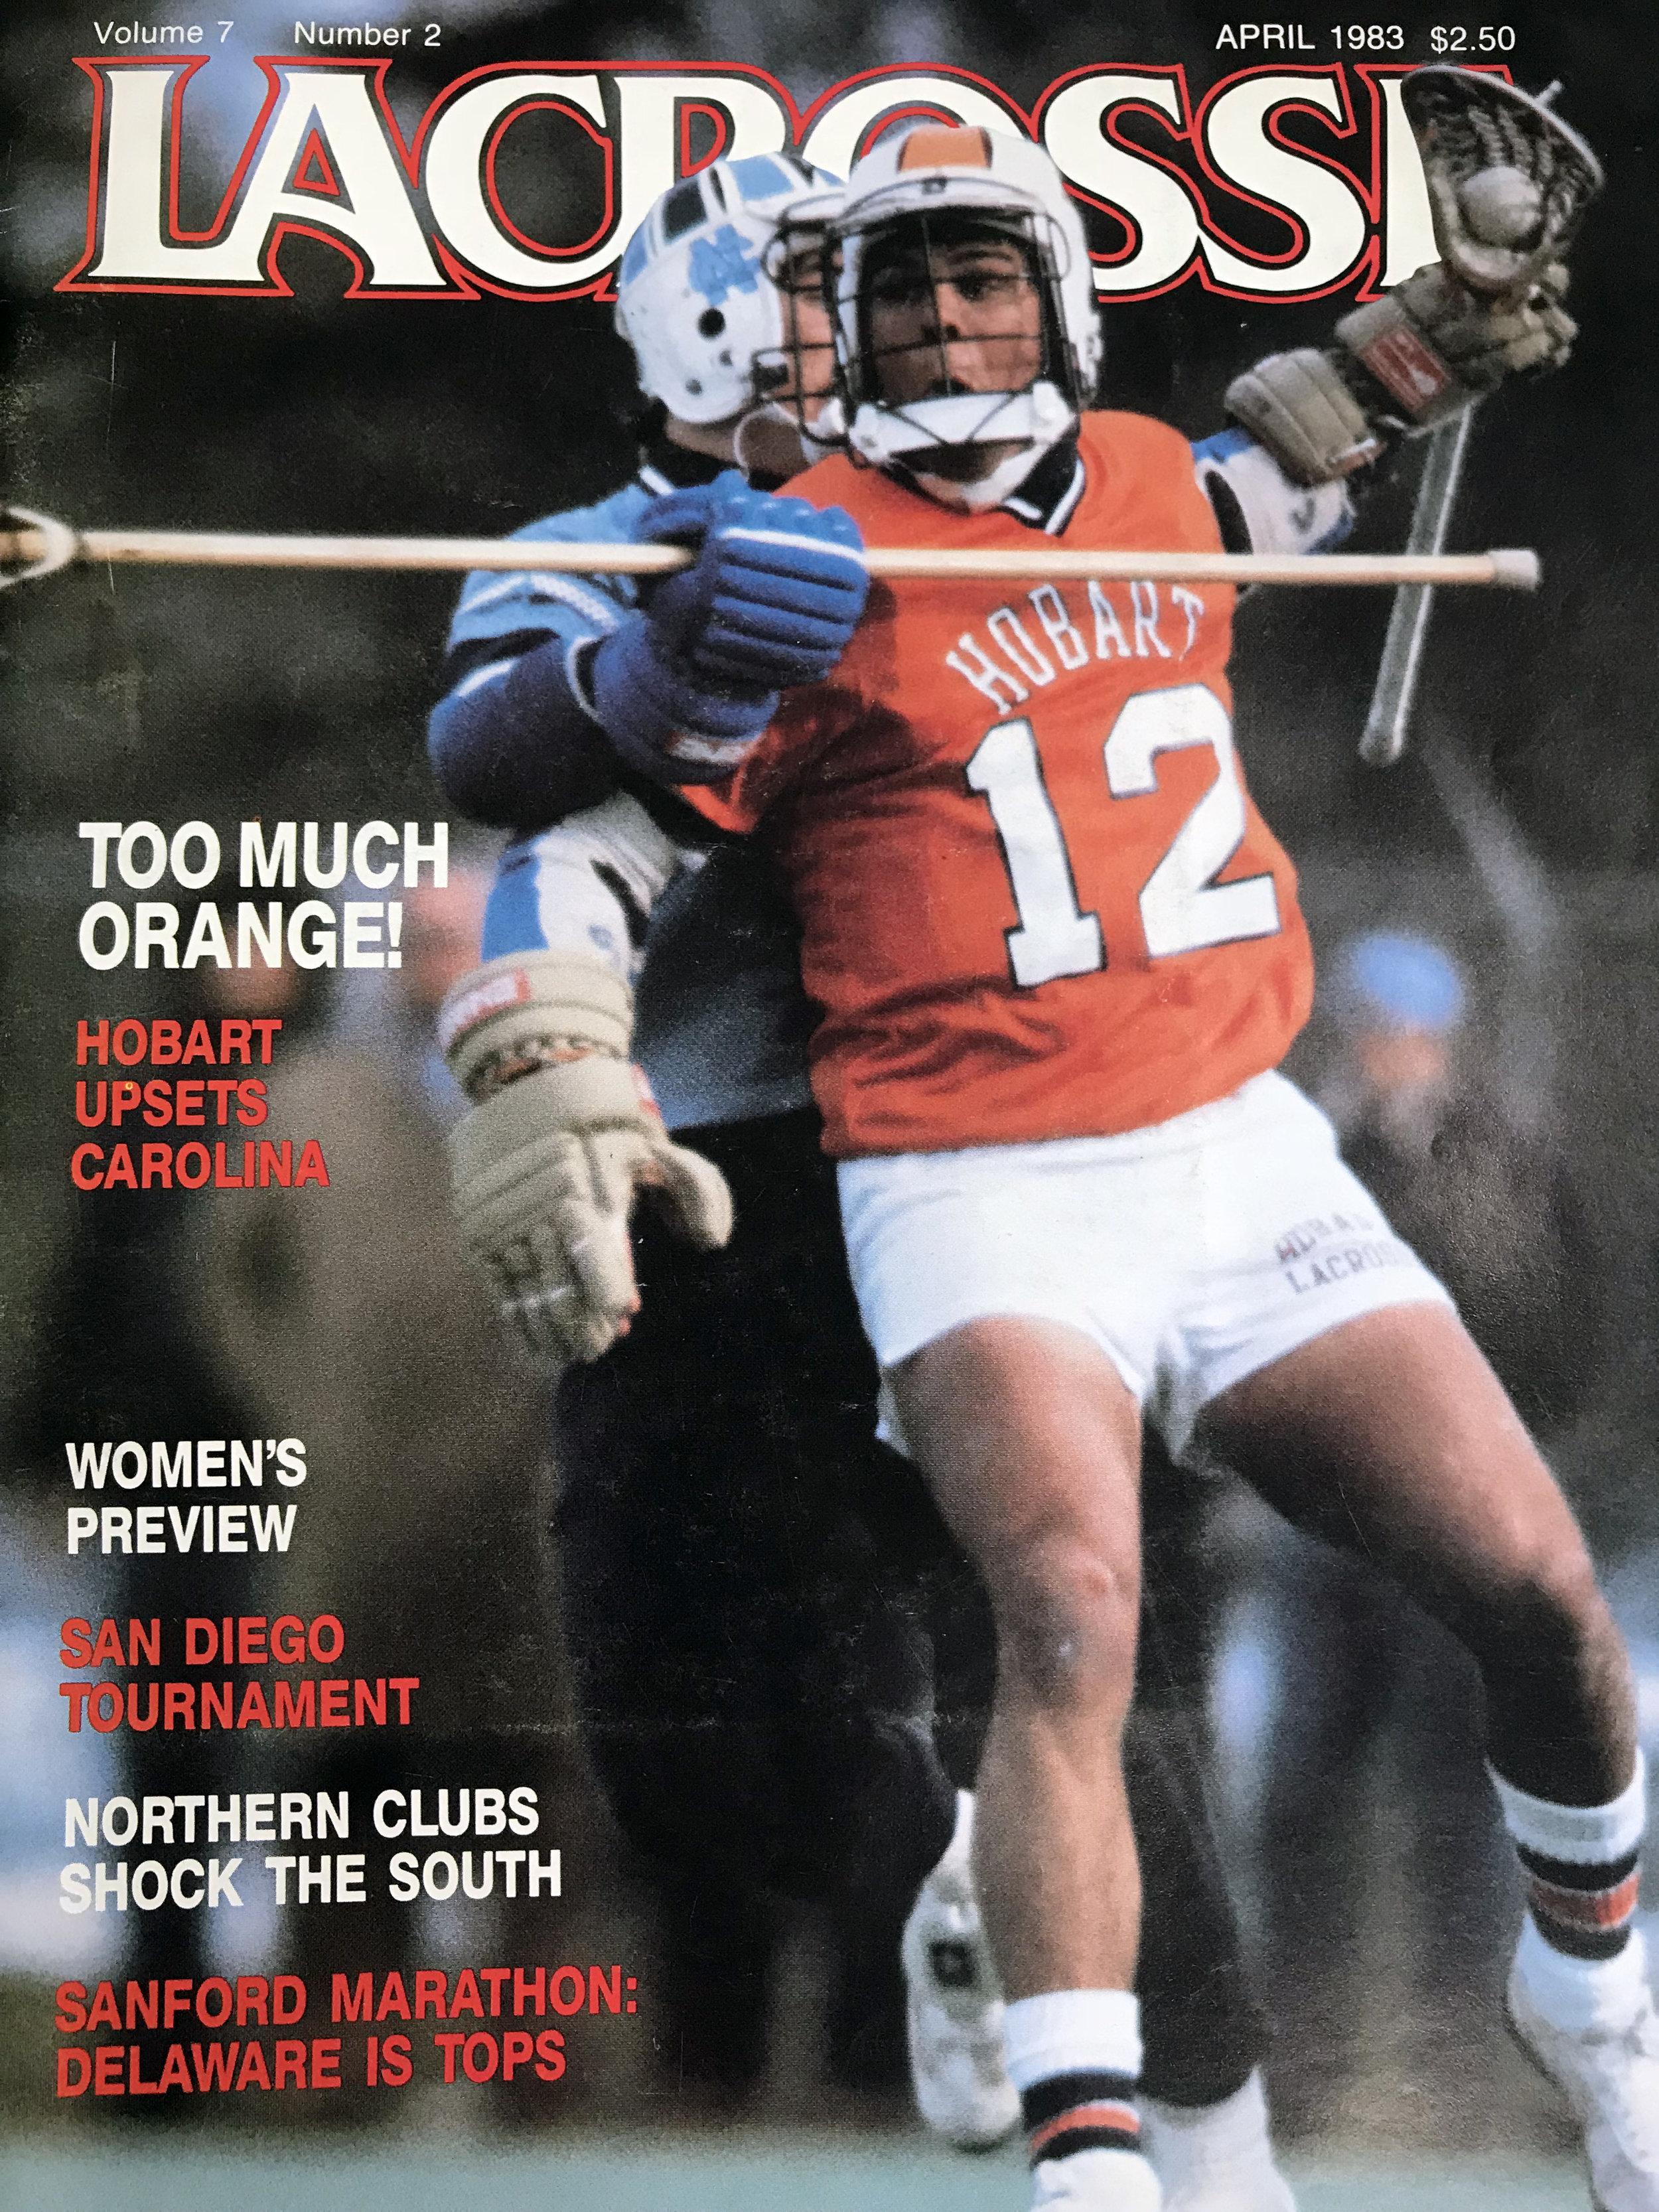 UNC alum and Hall of Famer Tom Haus covering Tom Grimaldi, 1983, Courtesy of  Lacrosse Magazine.